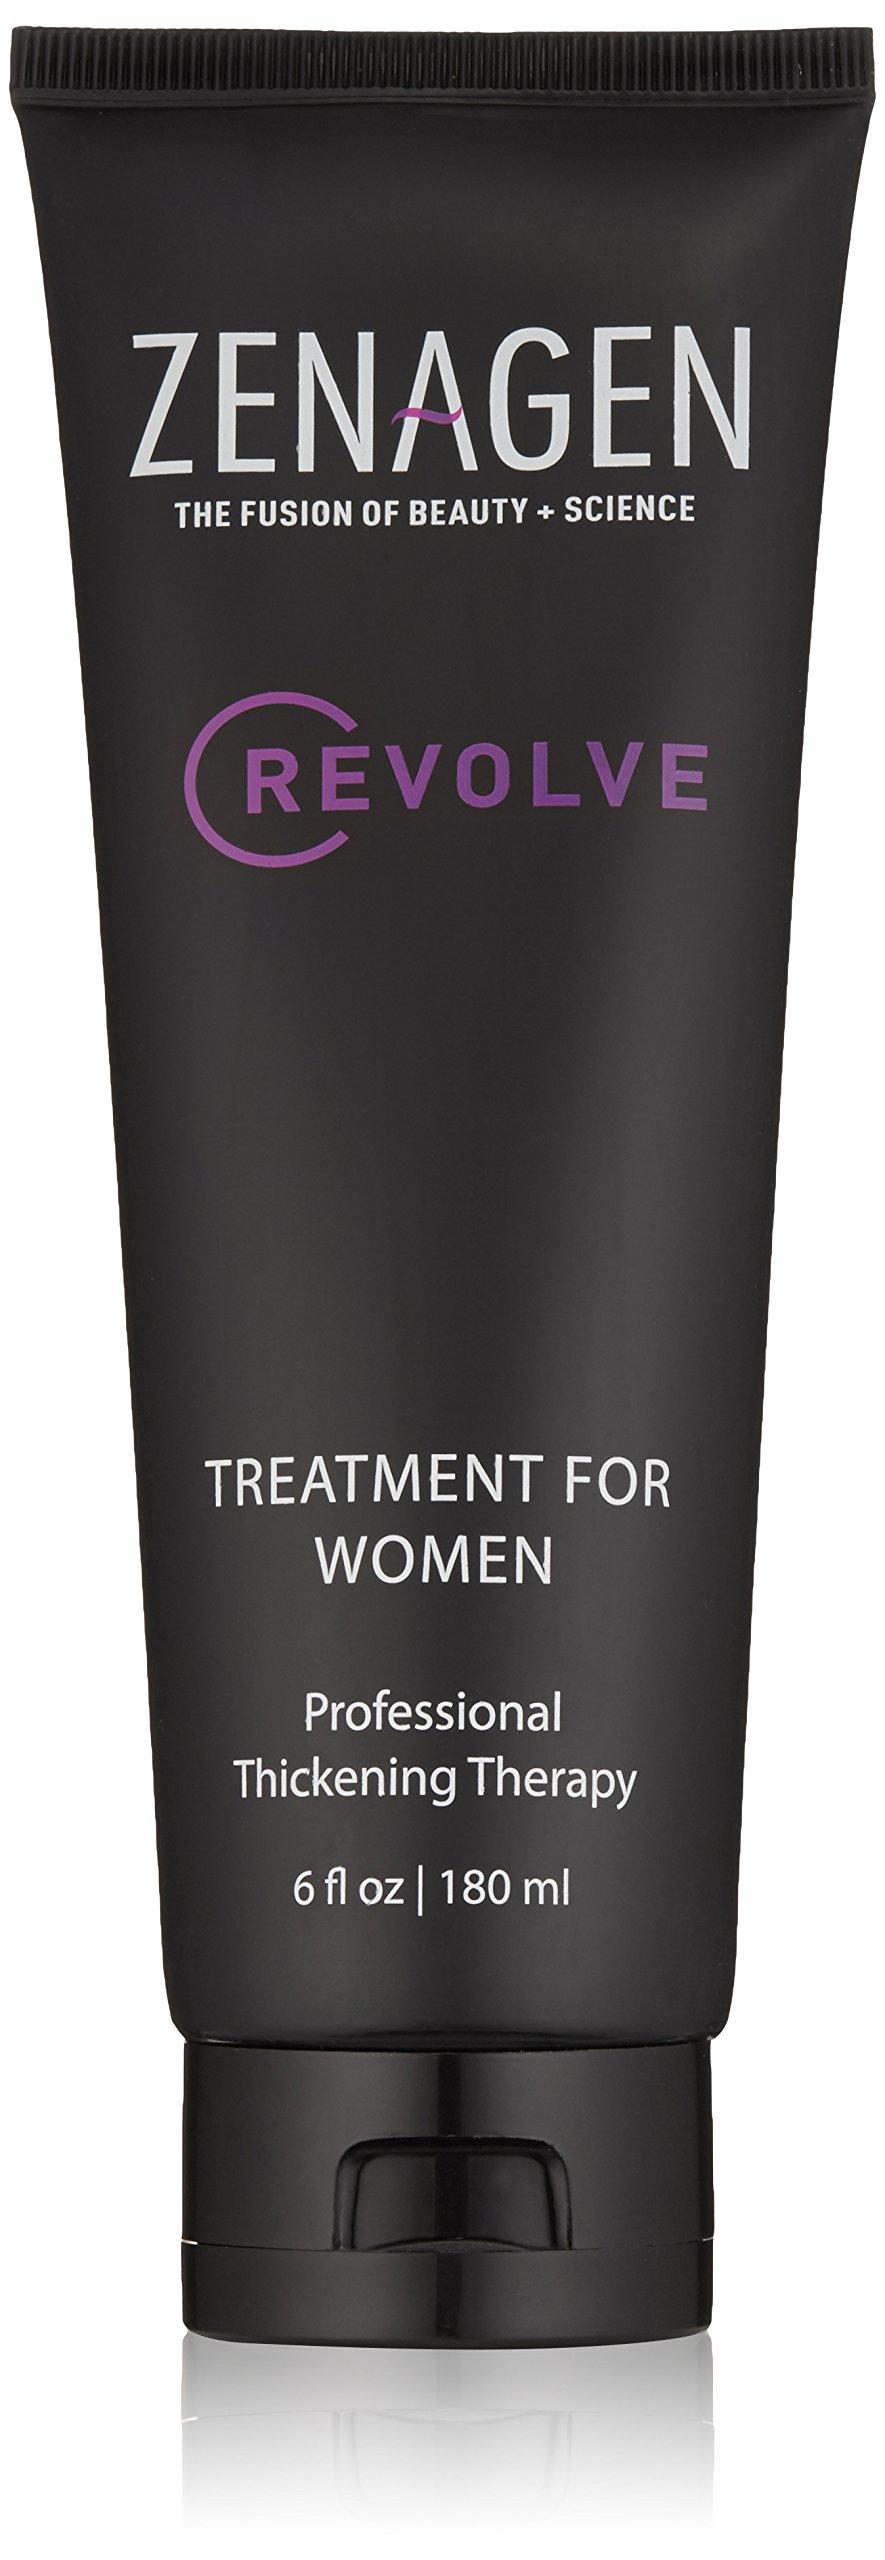 Zenagen Revolve Thickening and Hair Loss Shampoo Treatment for Women, 6 oz.